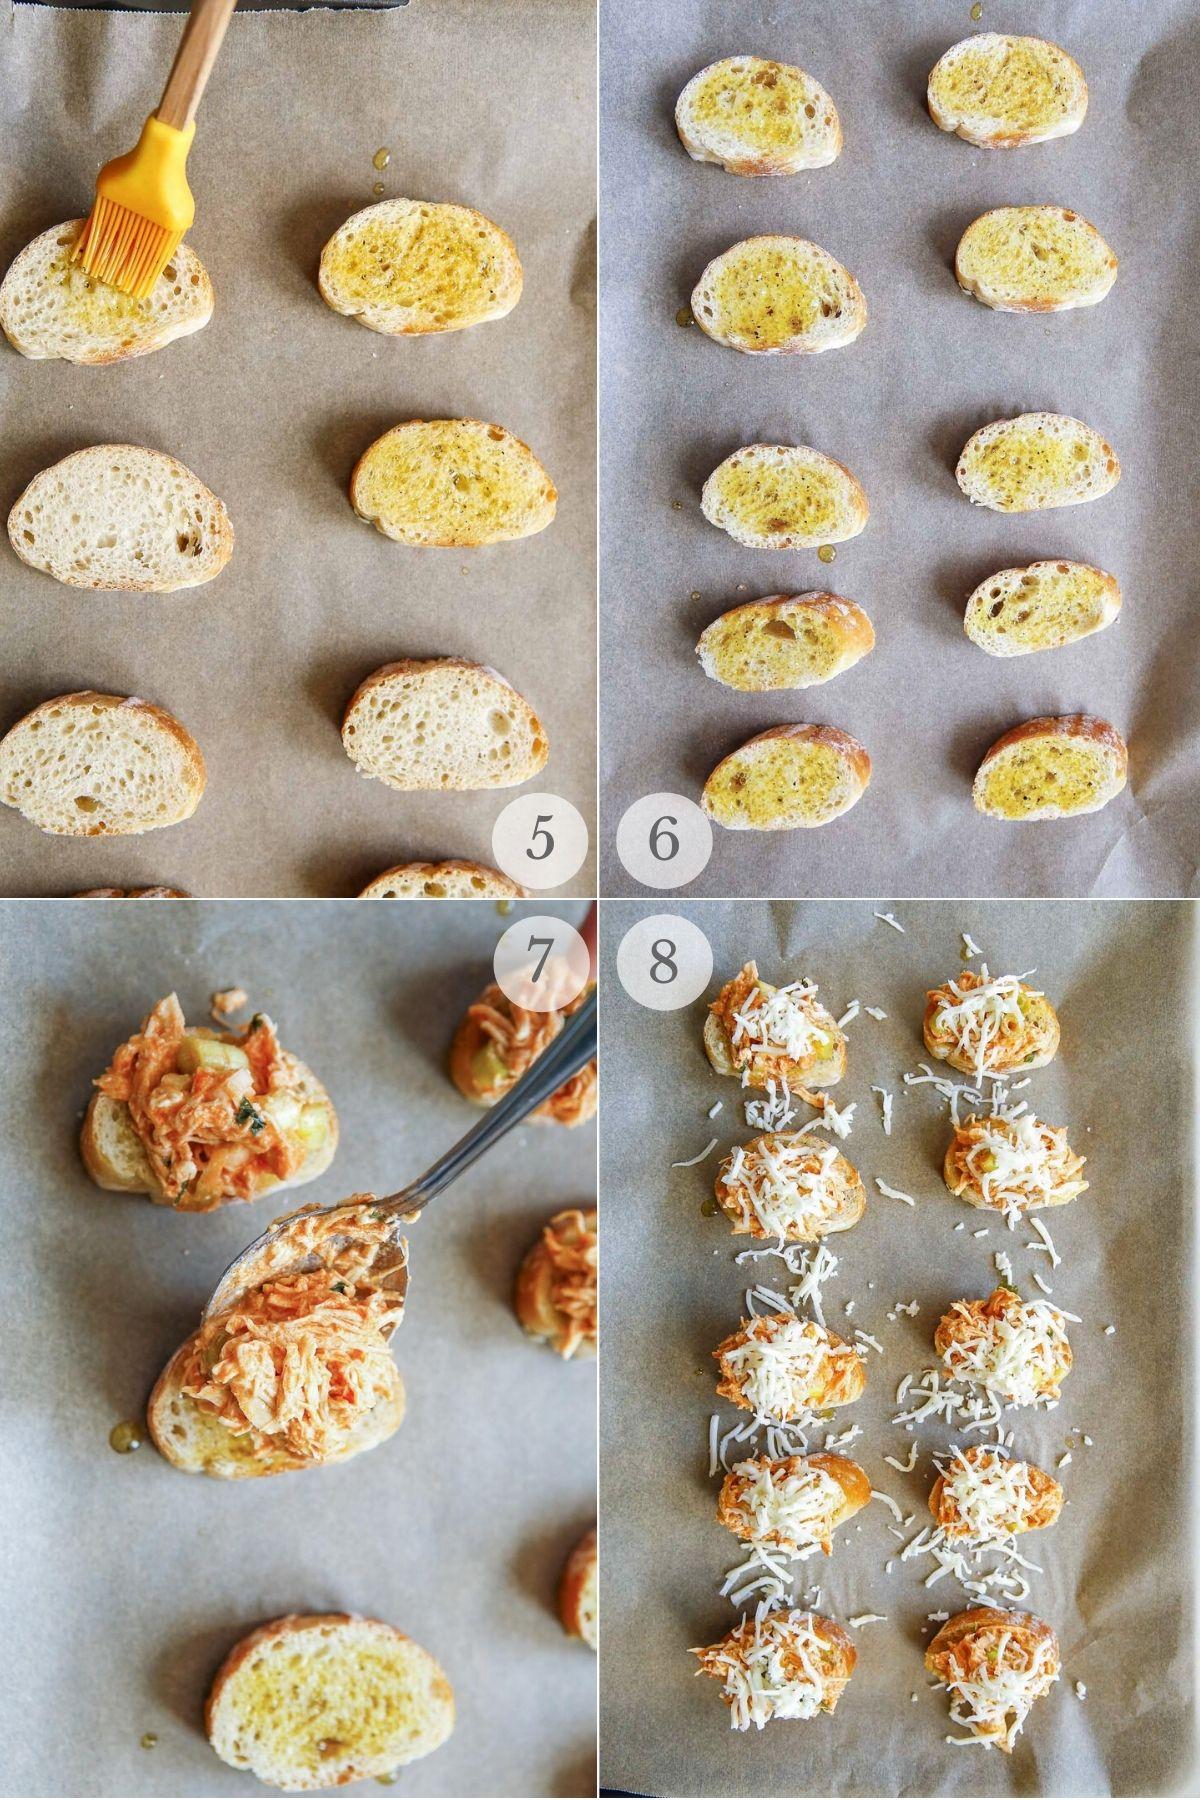 buffalo chicken crostini recipe steps 5-8